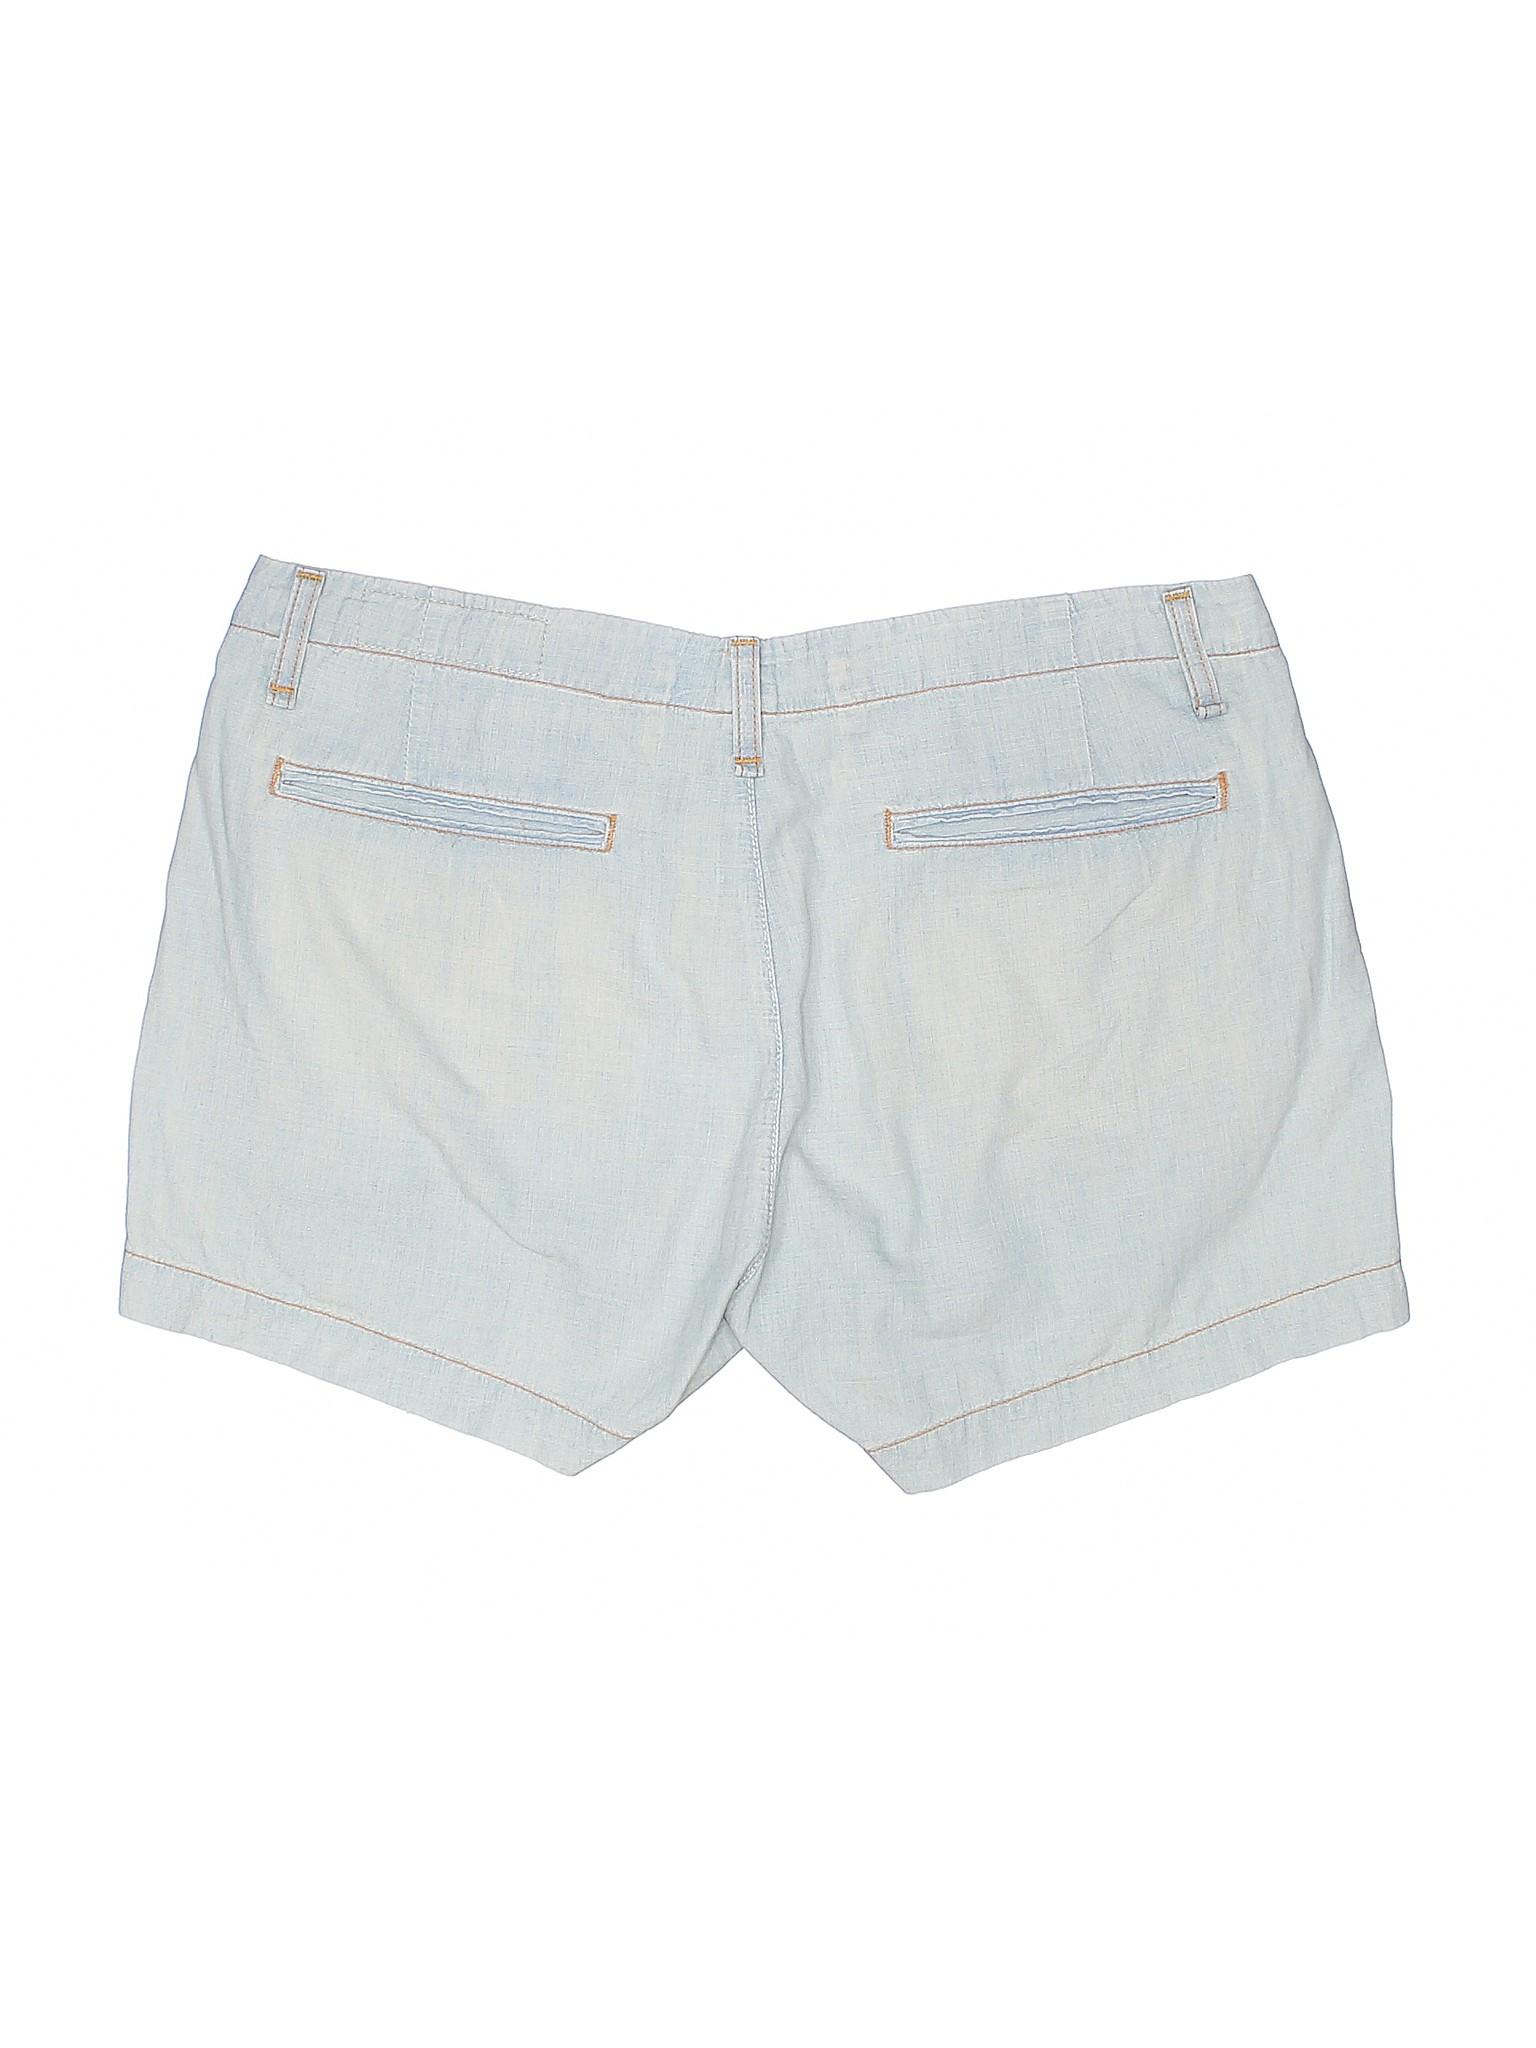 winter Bone Rag Shorts Denim JEAN Leisure amp; d4tn5Uxzdq